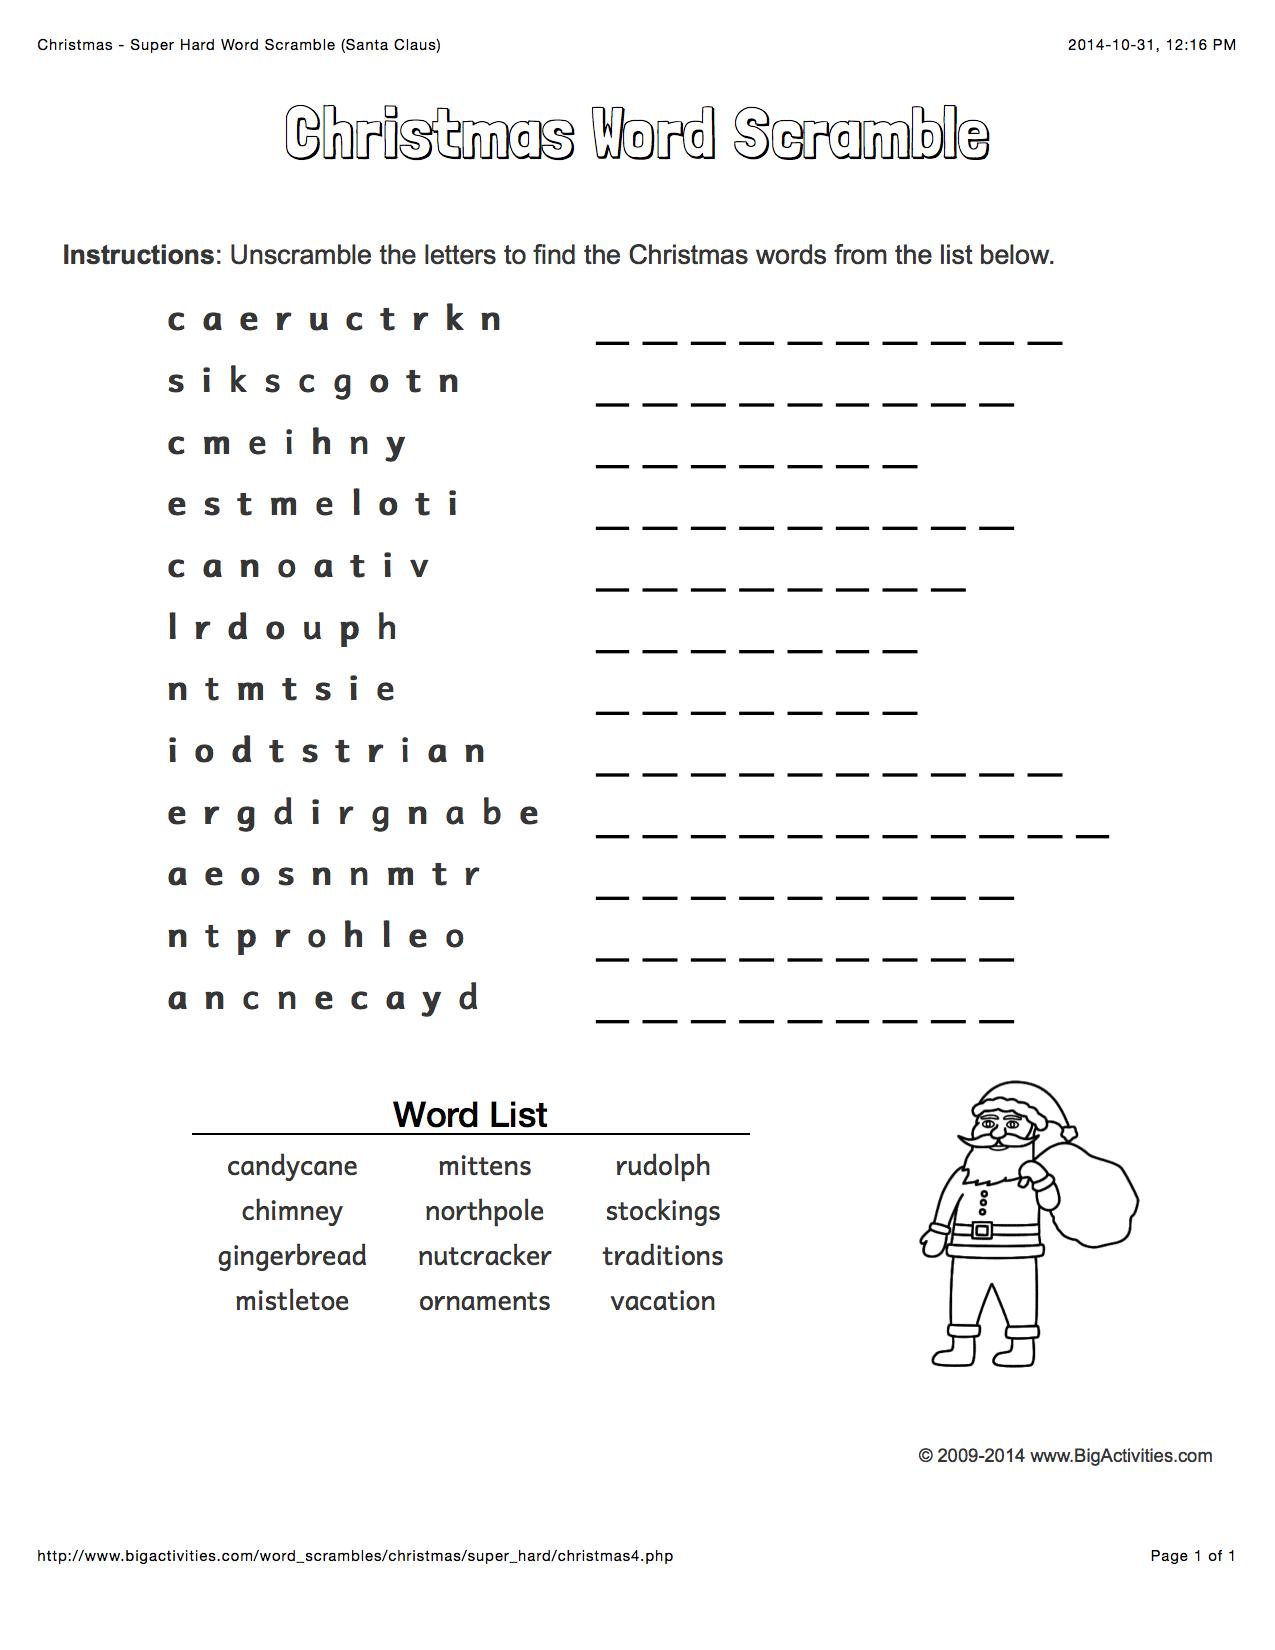 Uncategorized Hanukkah Worksheets christmas word scramble with santa claus 4 levels of difficulty hanukkah the torah scrambled words change each time you visit